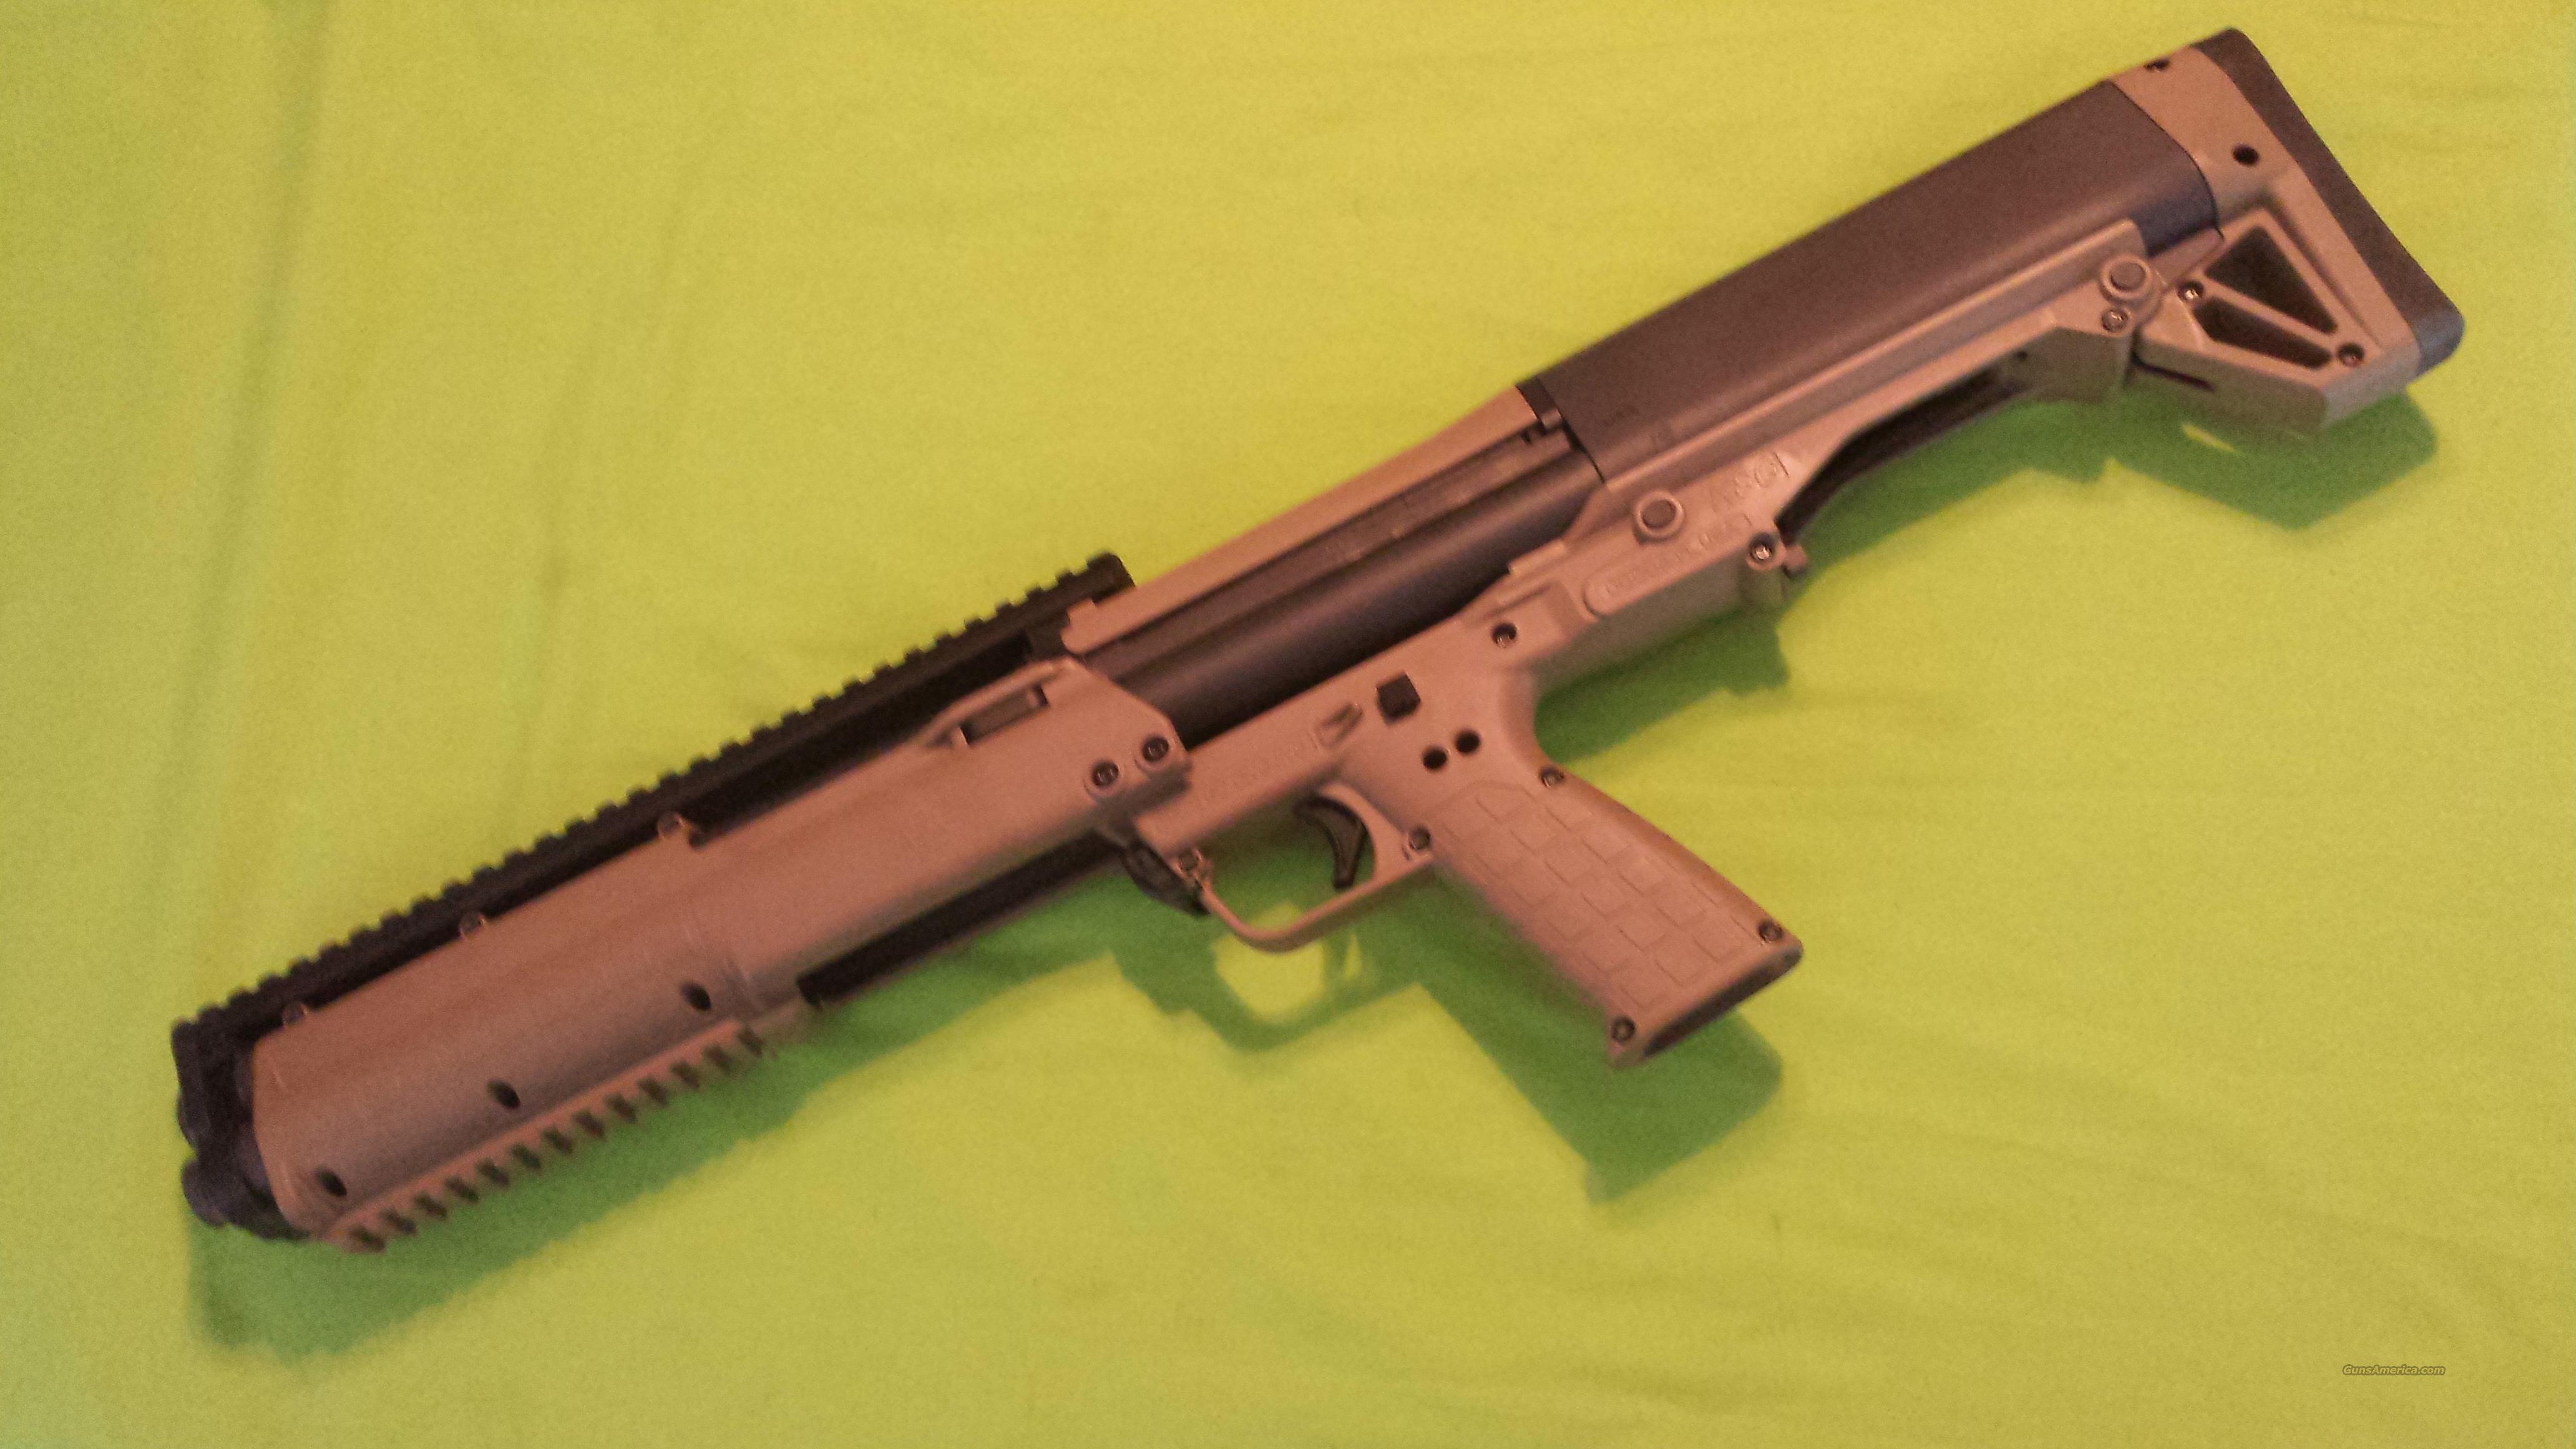 Kel Tec KELTEC KSG SHOTGUN 12GA 14 RDS TAN FDE  Guns > Shotguns > Kel-Tec Shotguns > KSG